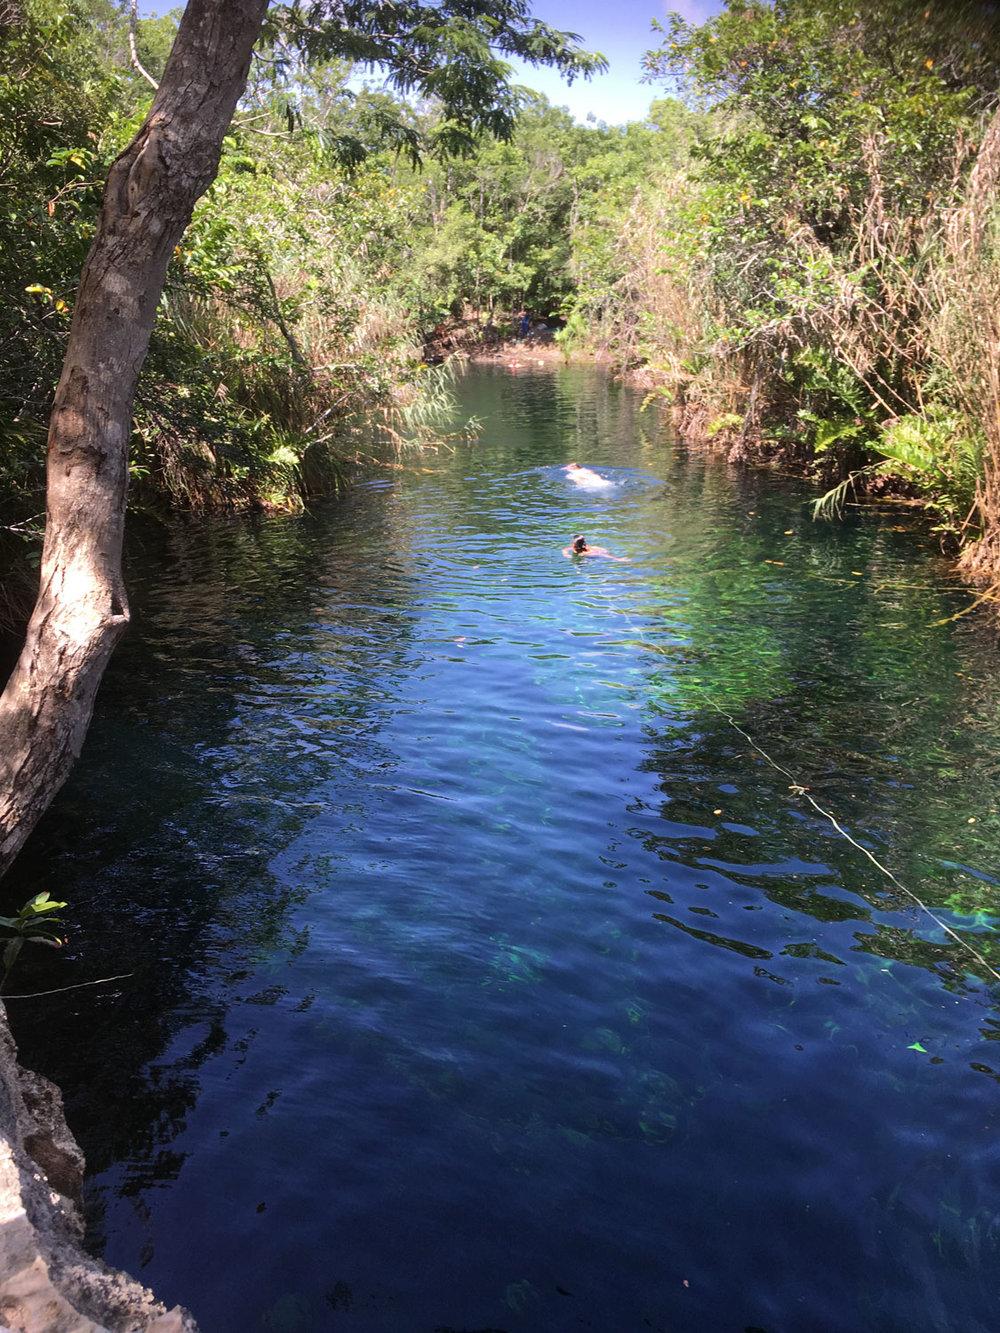 Hammocks_and_Ruins_Riviera_Maya_What_to_Do_Playa_Del_Carmen_Tulum_Cenotes_Cenote_Escondido_8.jpg